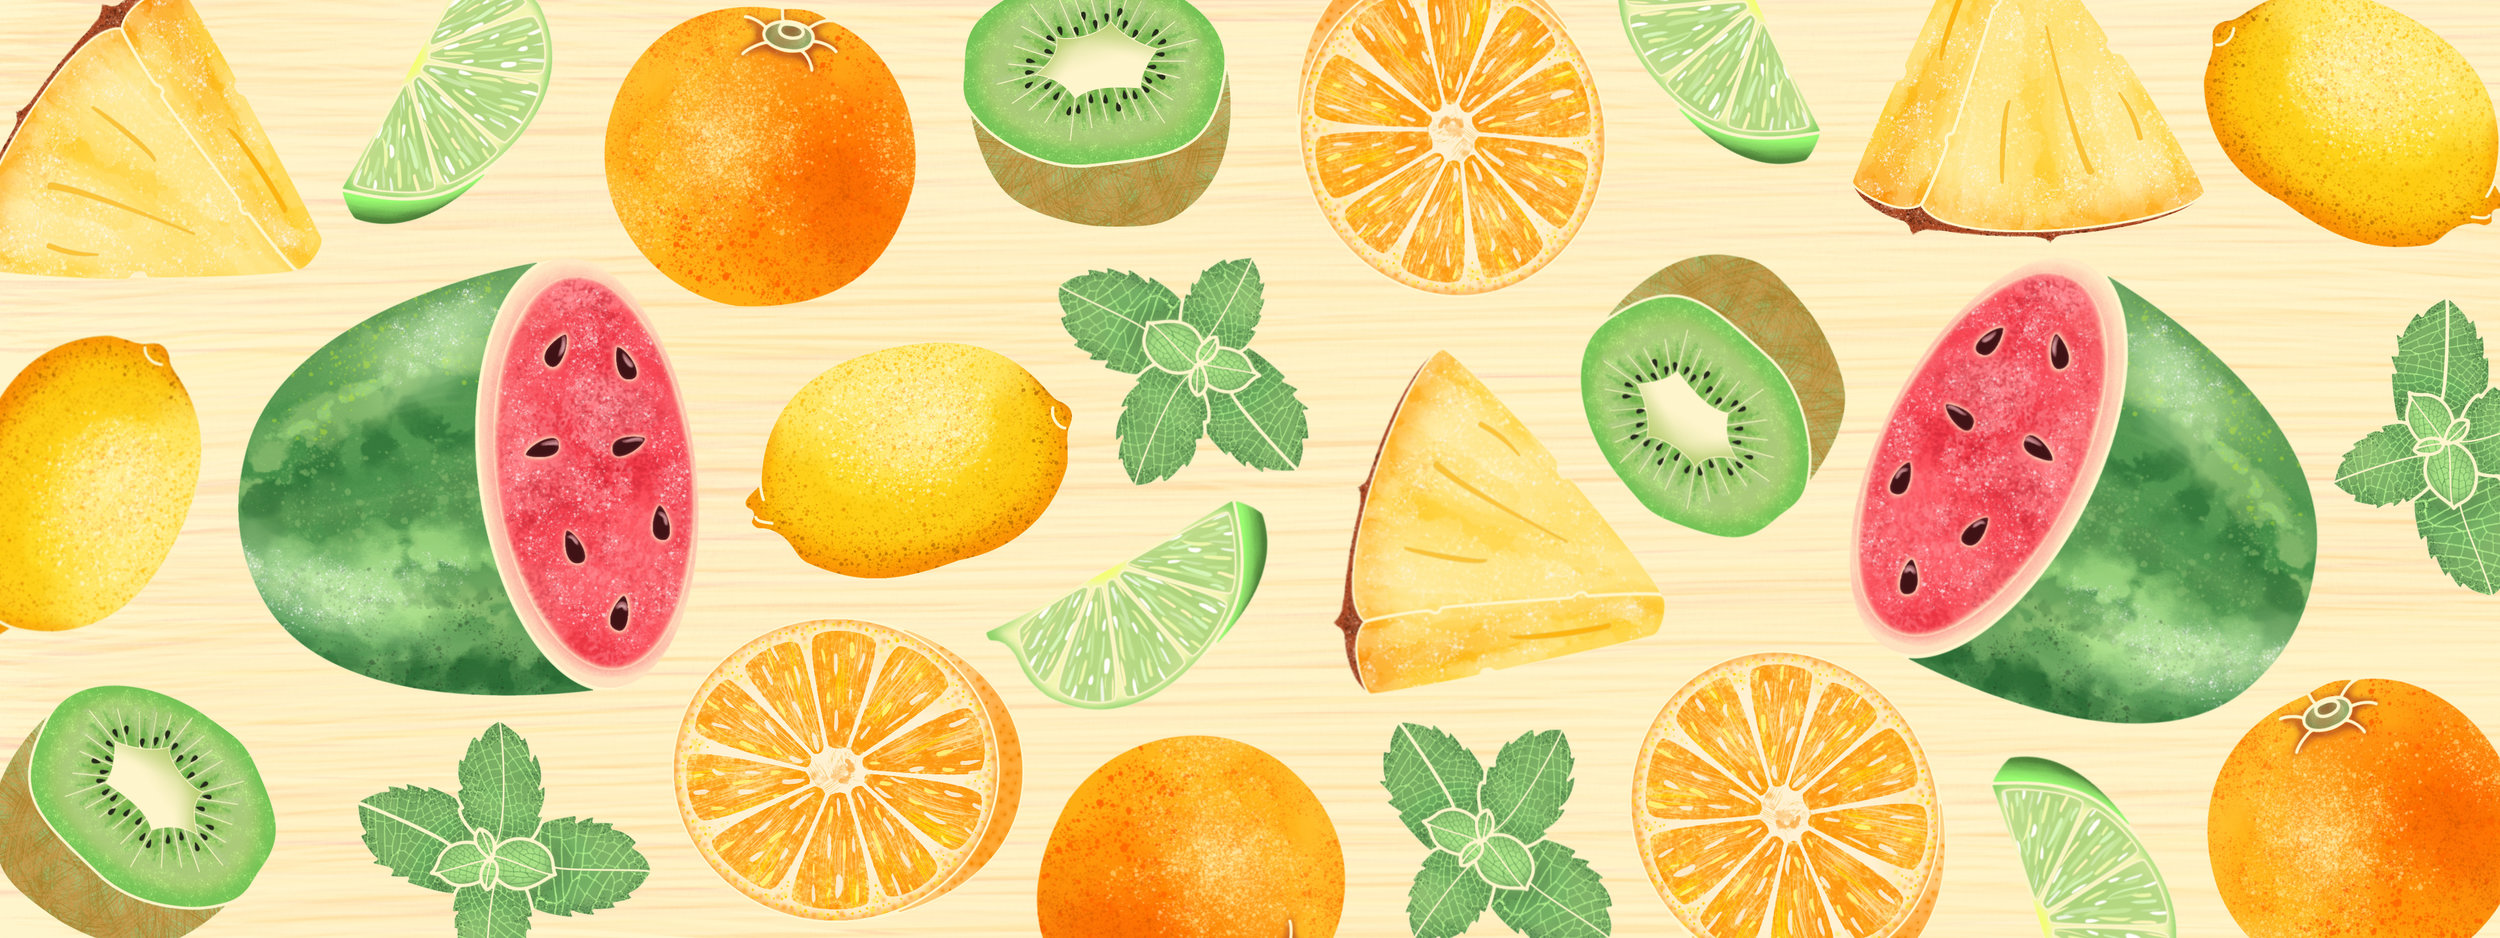 Juicy fruit: watermelon, lemon, lime, orange, pineapple, kiwi and mint.